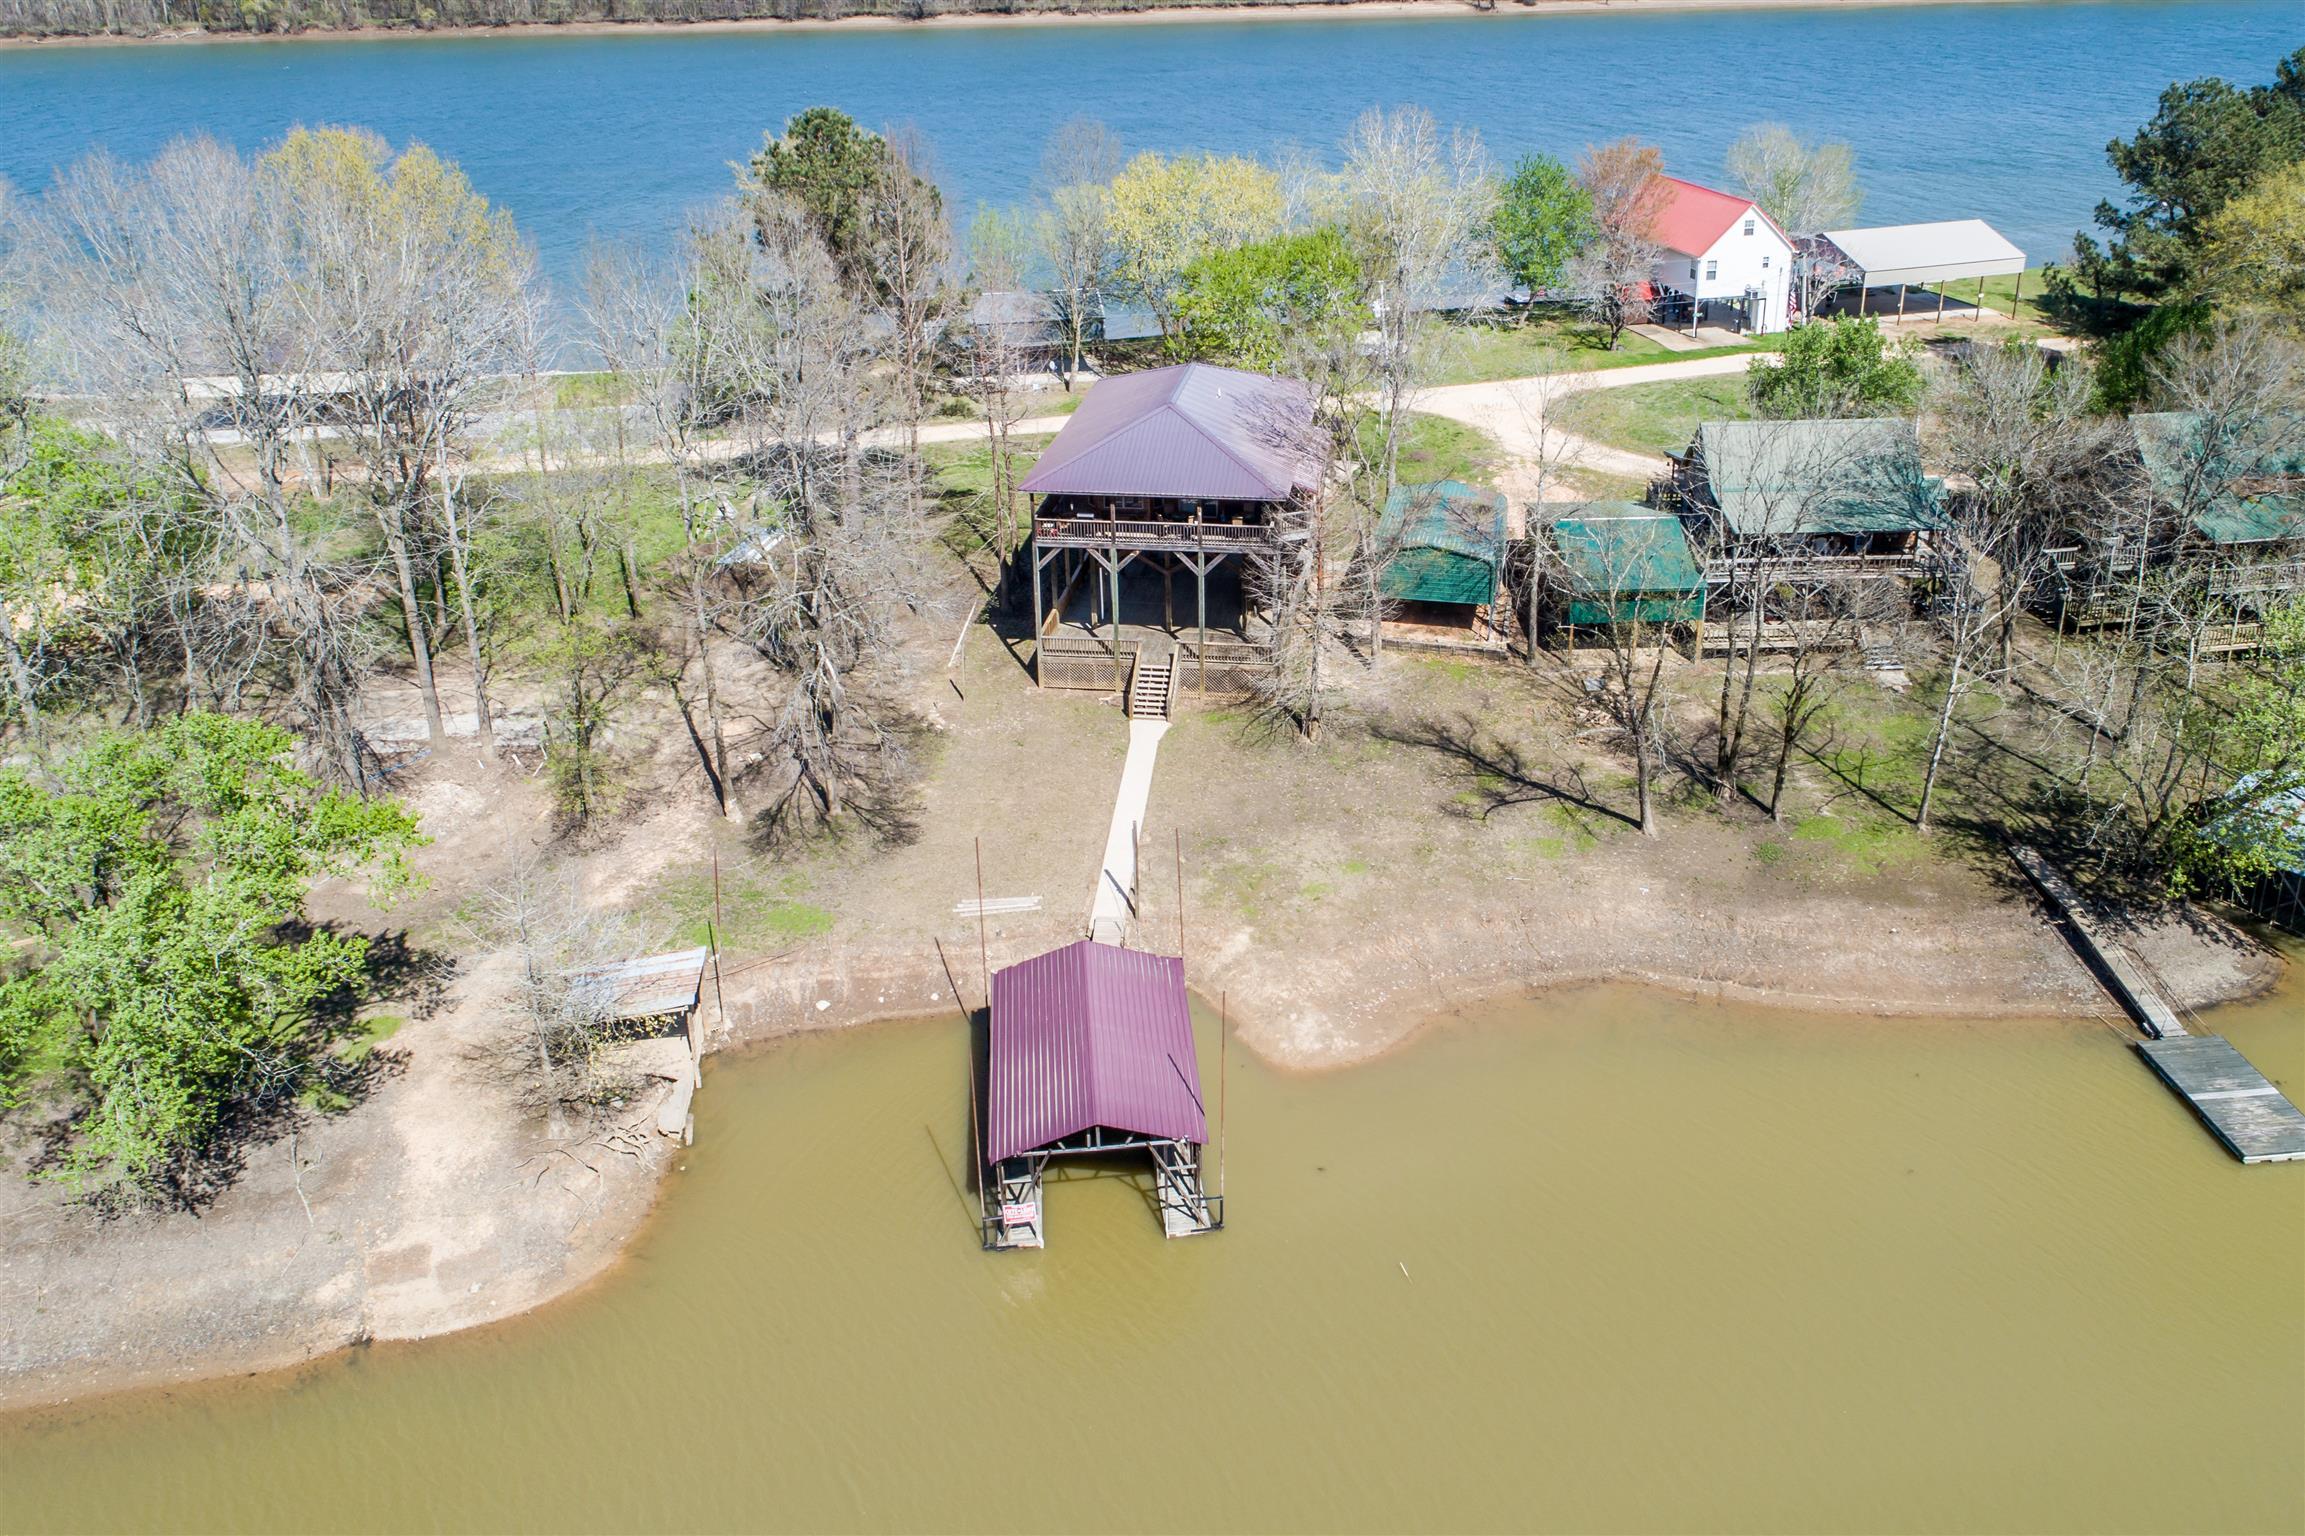 549 Gumdale Cv, Decaturville, TN 38329 - Decaturville, TN real estate listing